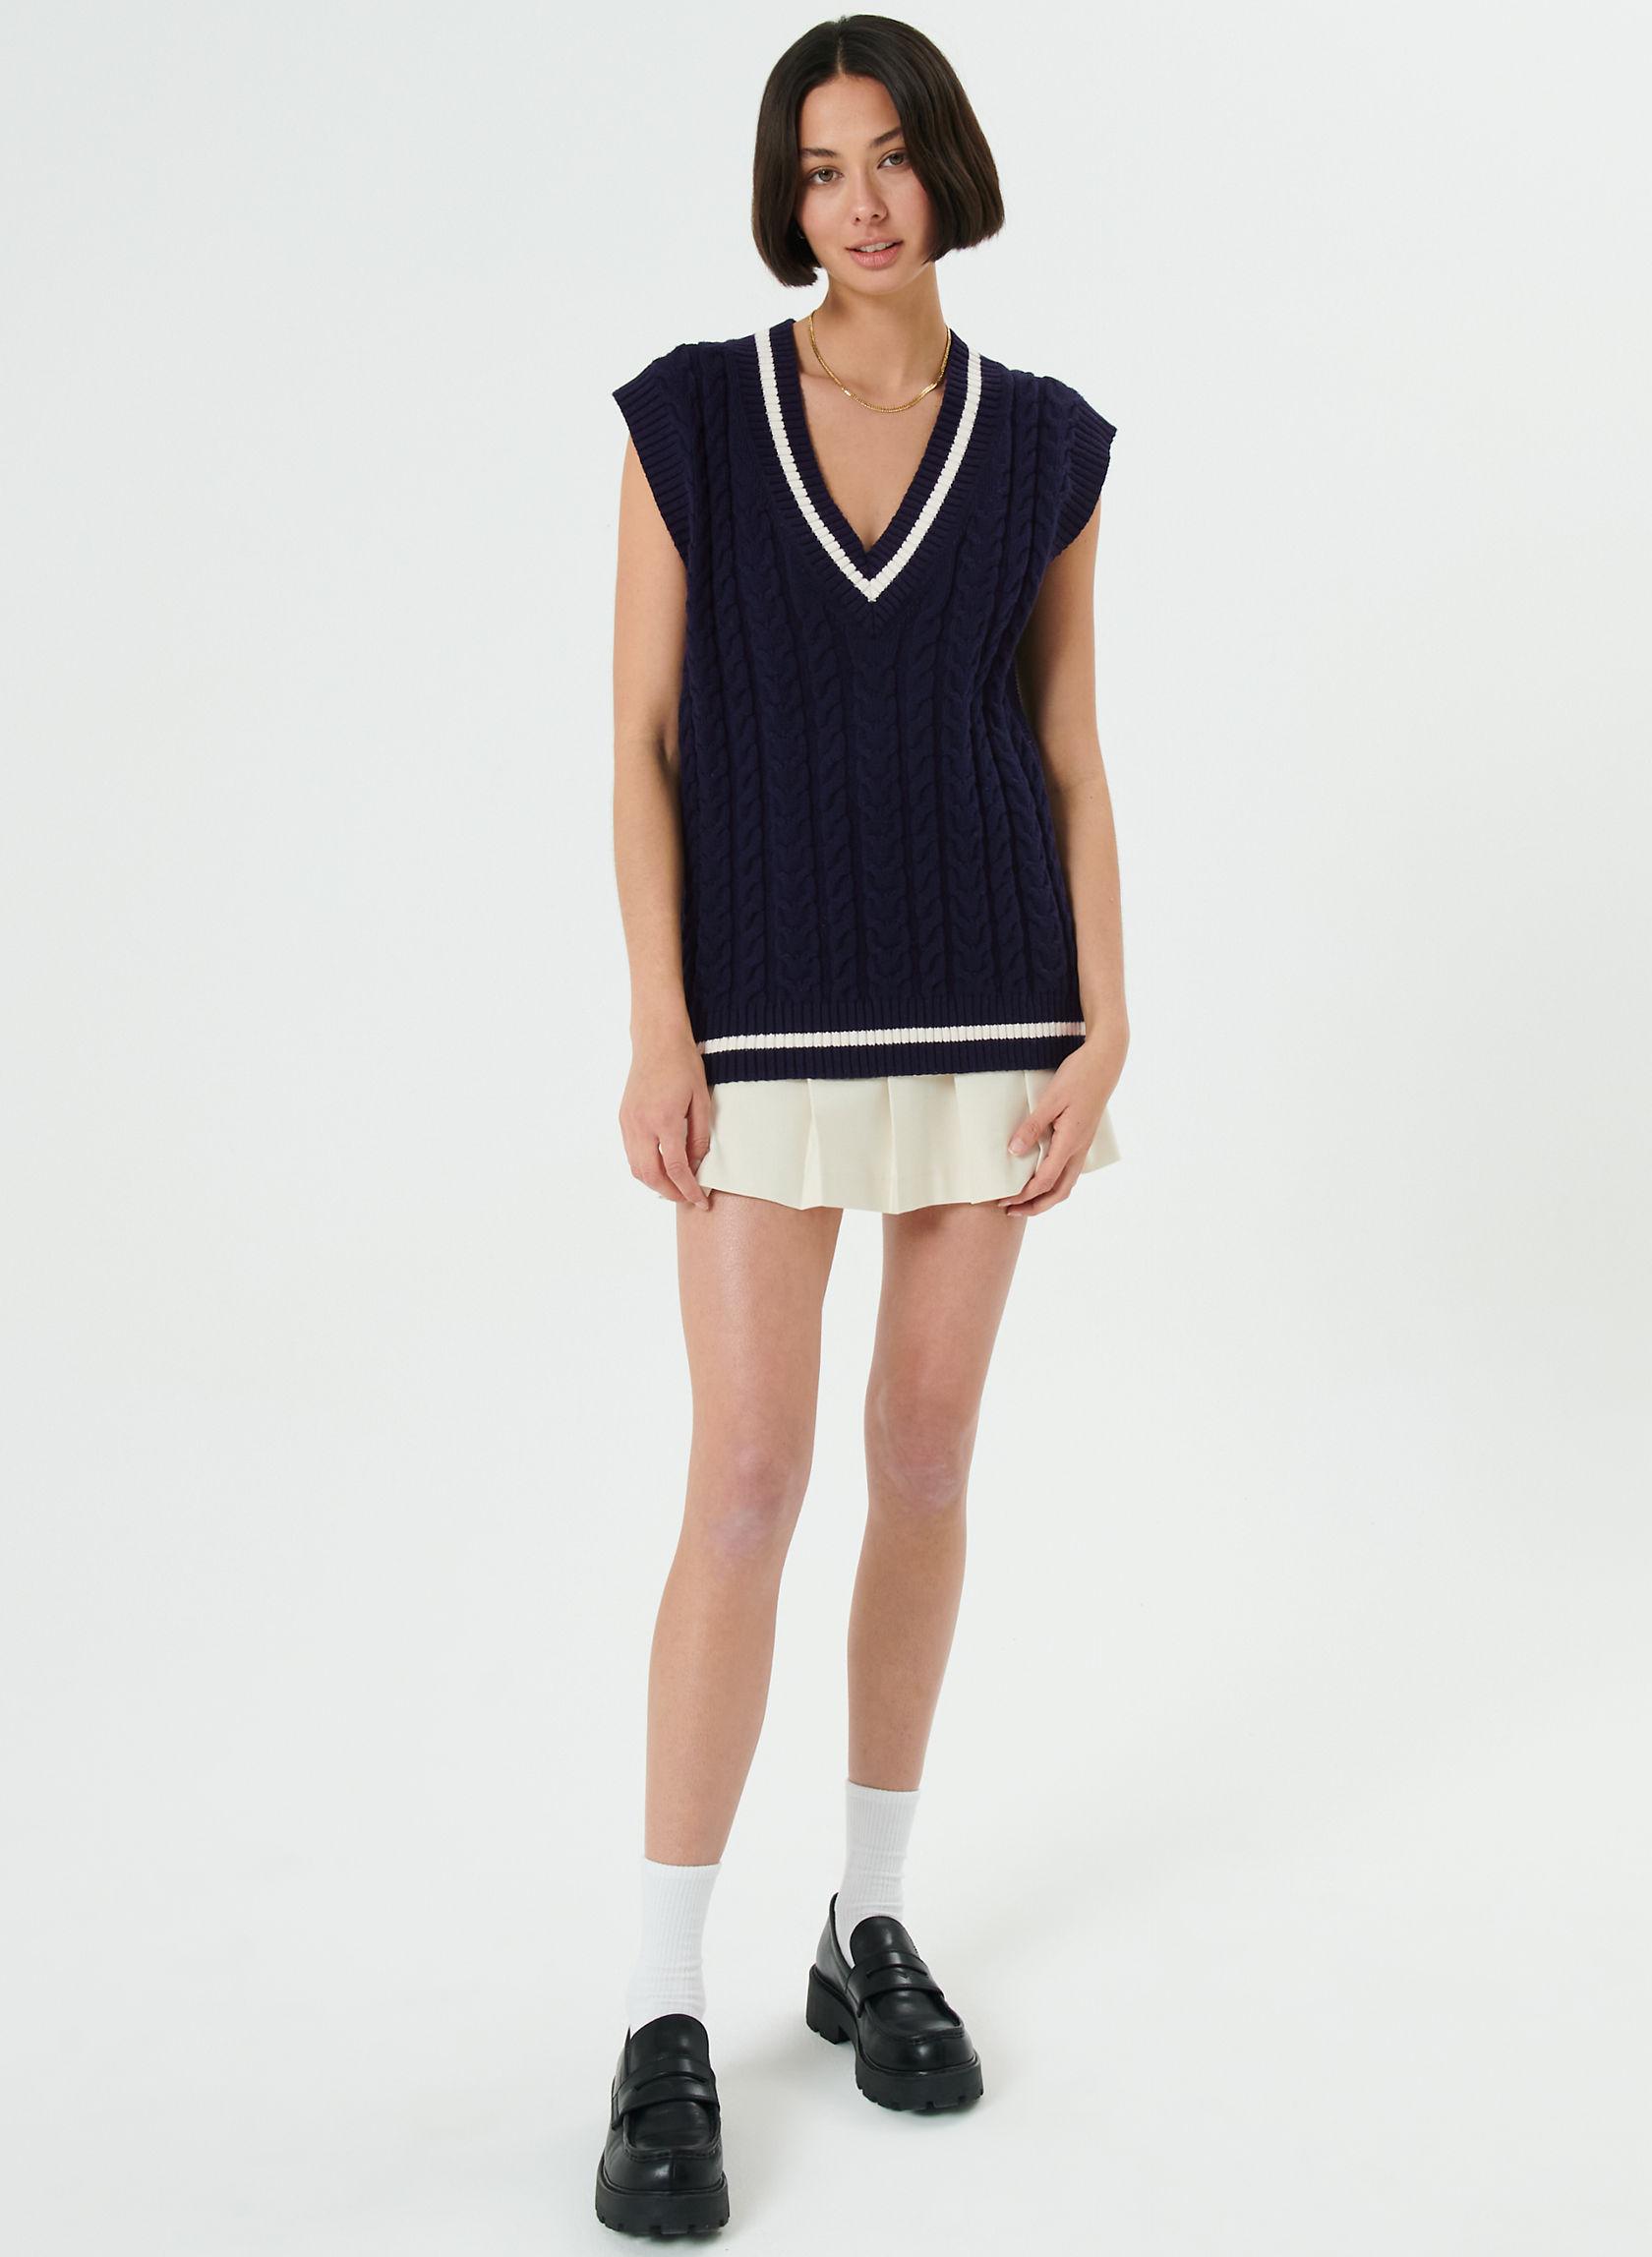 WINSTON SWEATER VEST - Cable-knit sweater vest